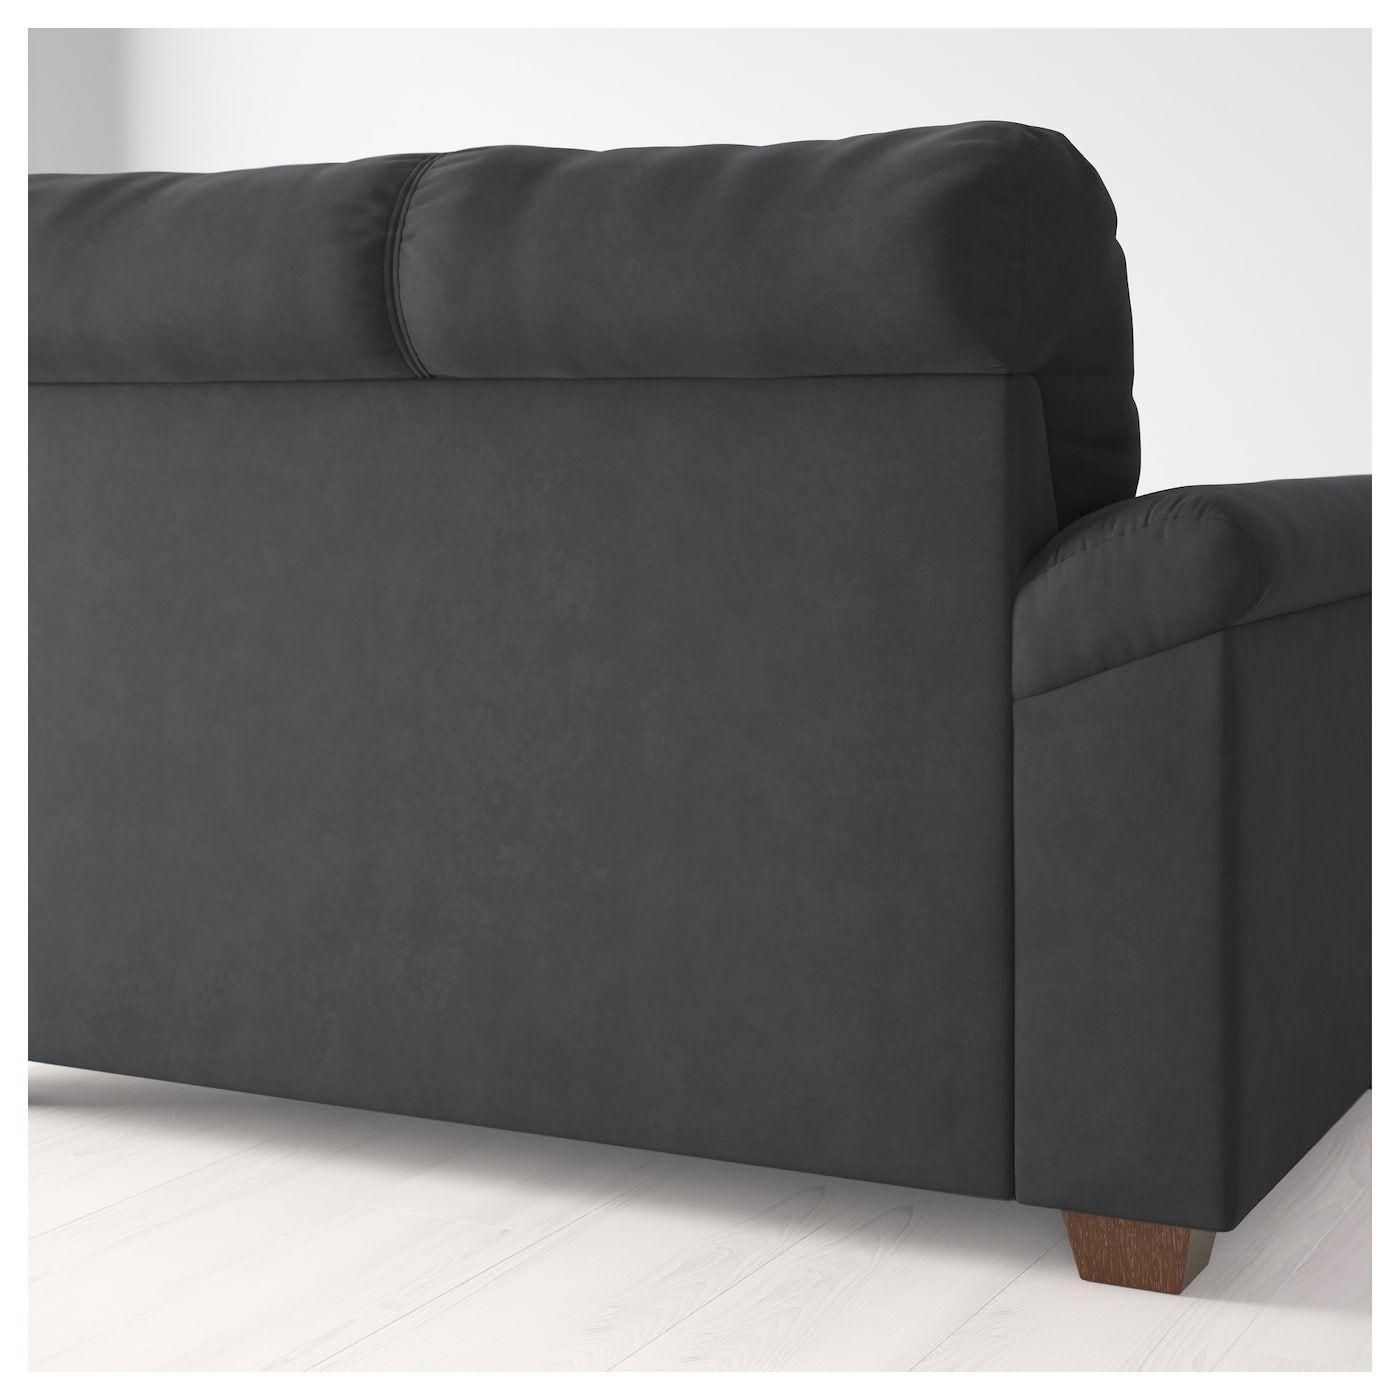 Knislinge Loveseat Samsta Dark Gray Love Seat Ikea Seat Cushions